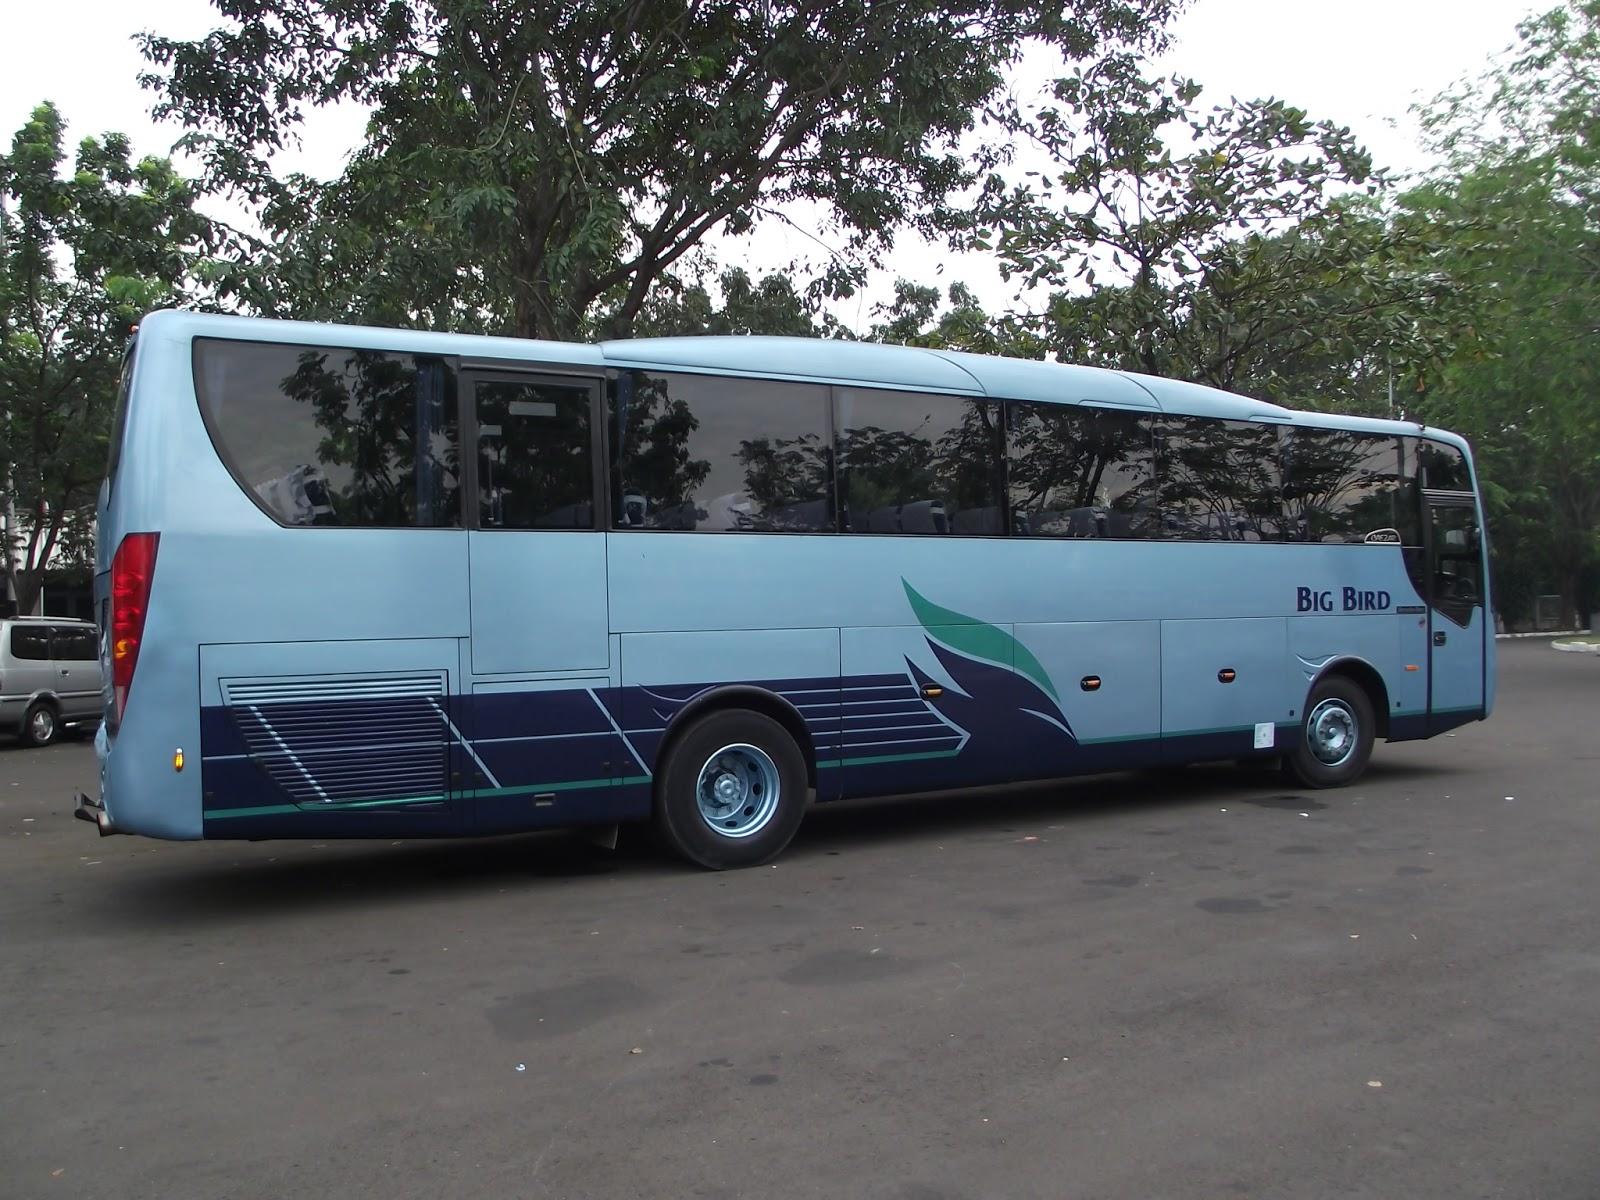 Bus Premium Luxury - Agar Tidak Salah, Berikut Gambar Bus Pariwisata Sesuai Jenisnya